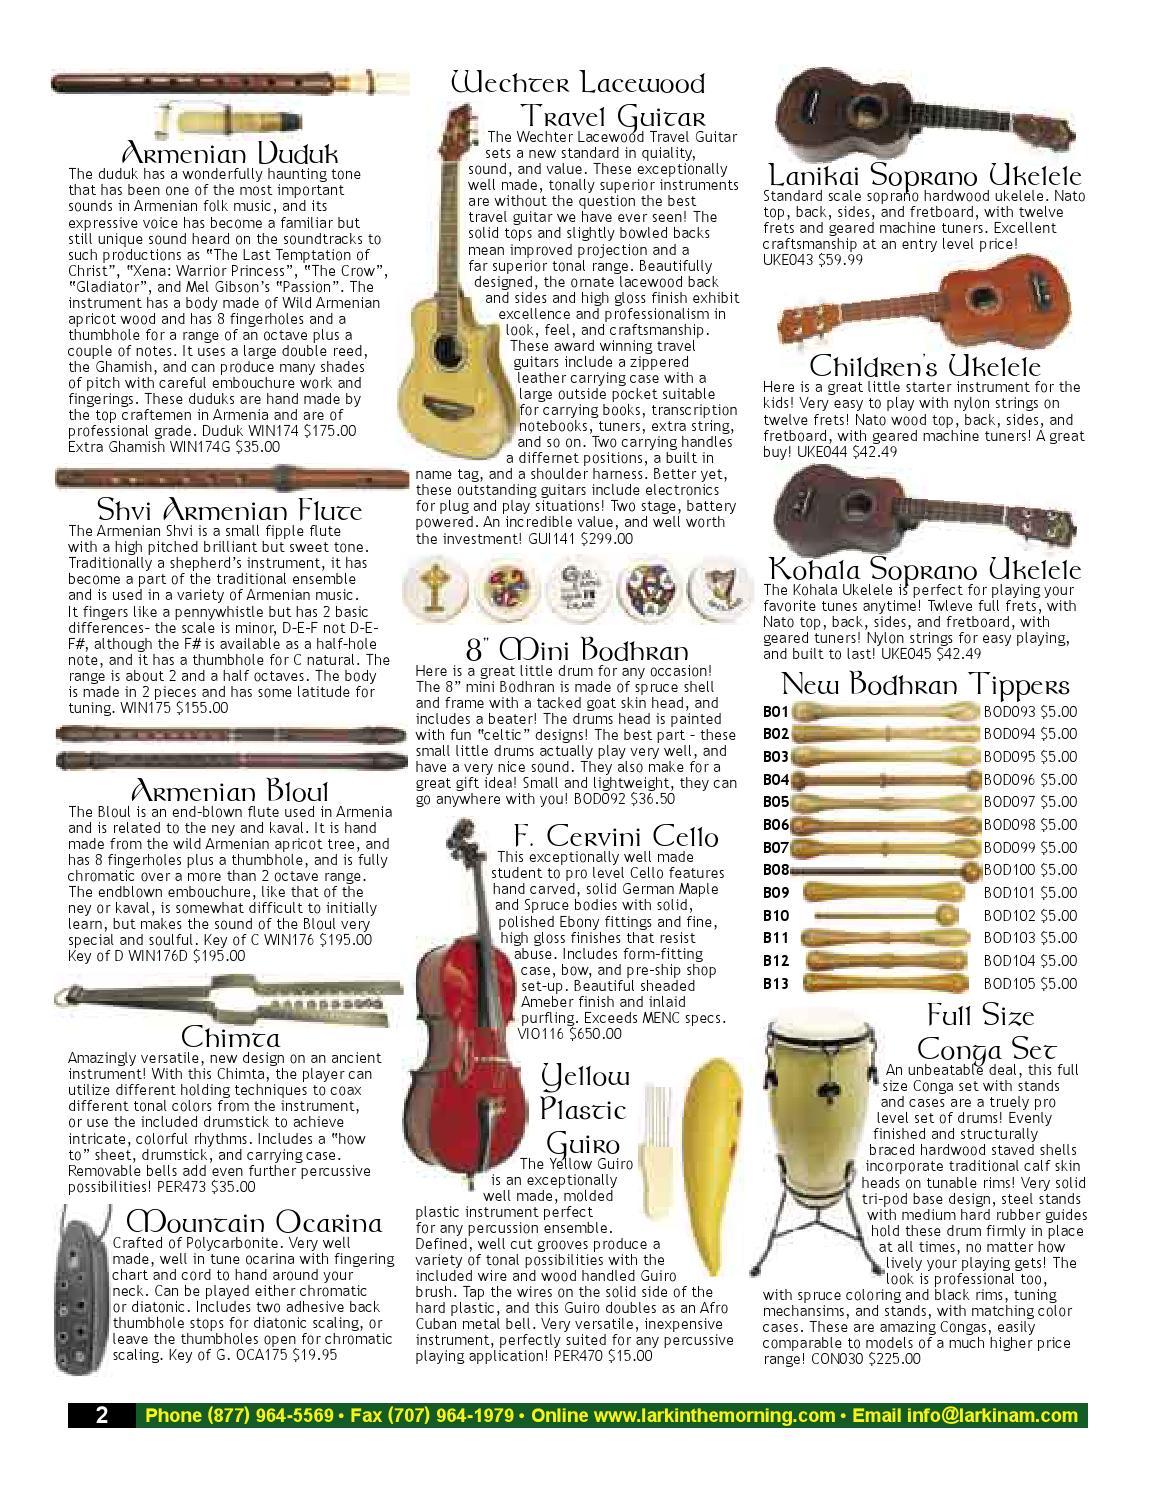 Lark In The Morning Retail Catalog 2004 by Lark In The